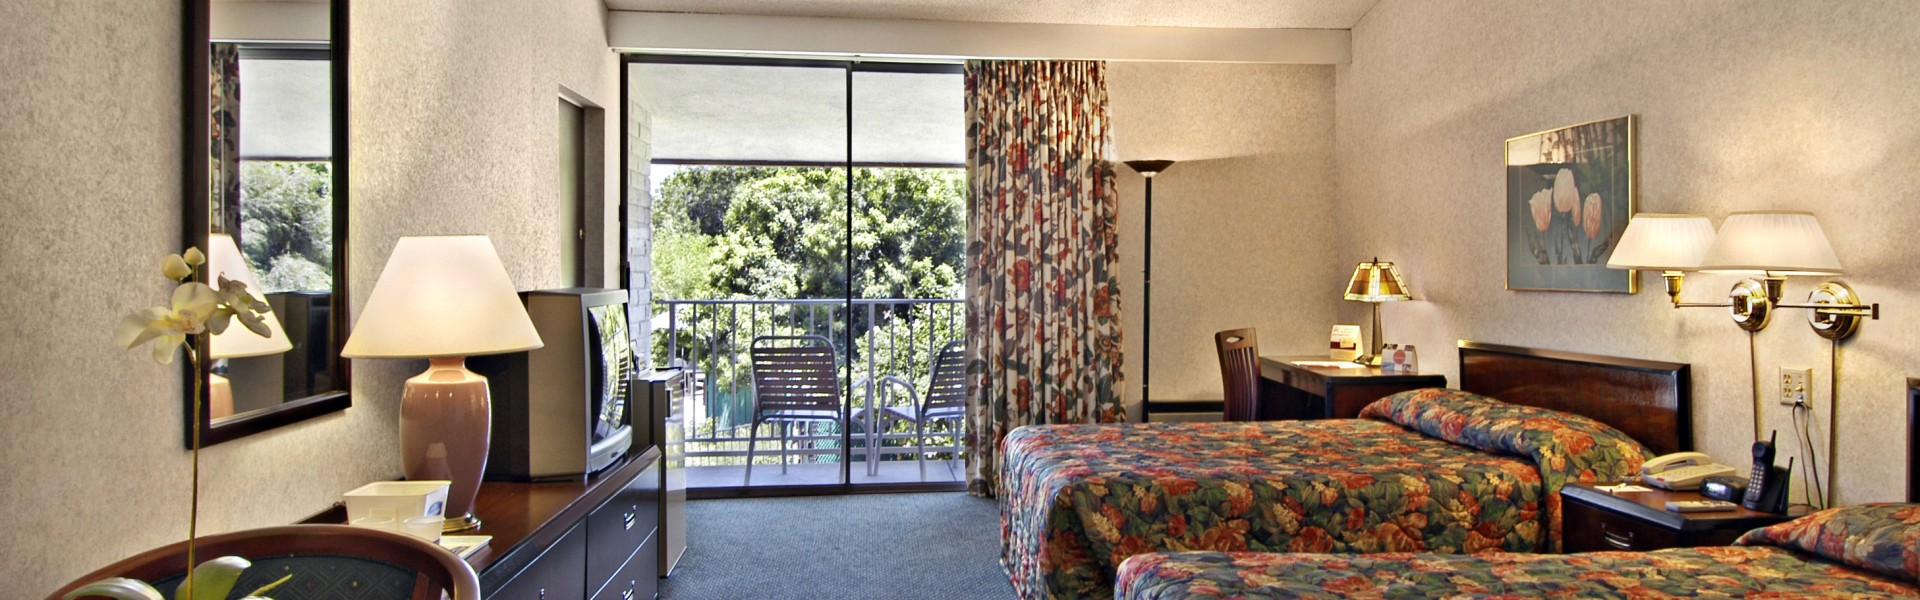 Knights Inn room in Claremont CA